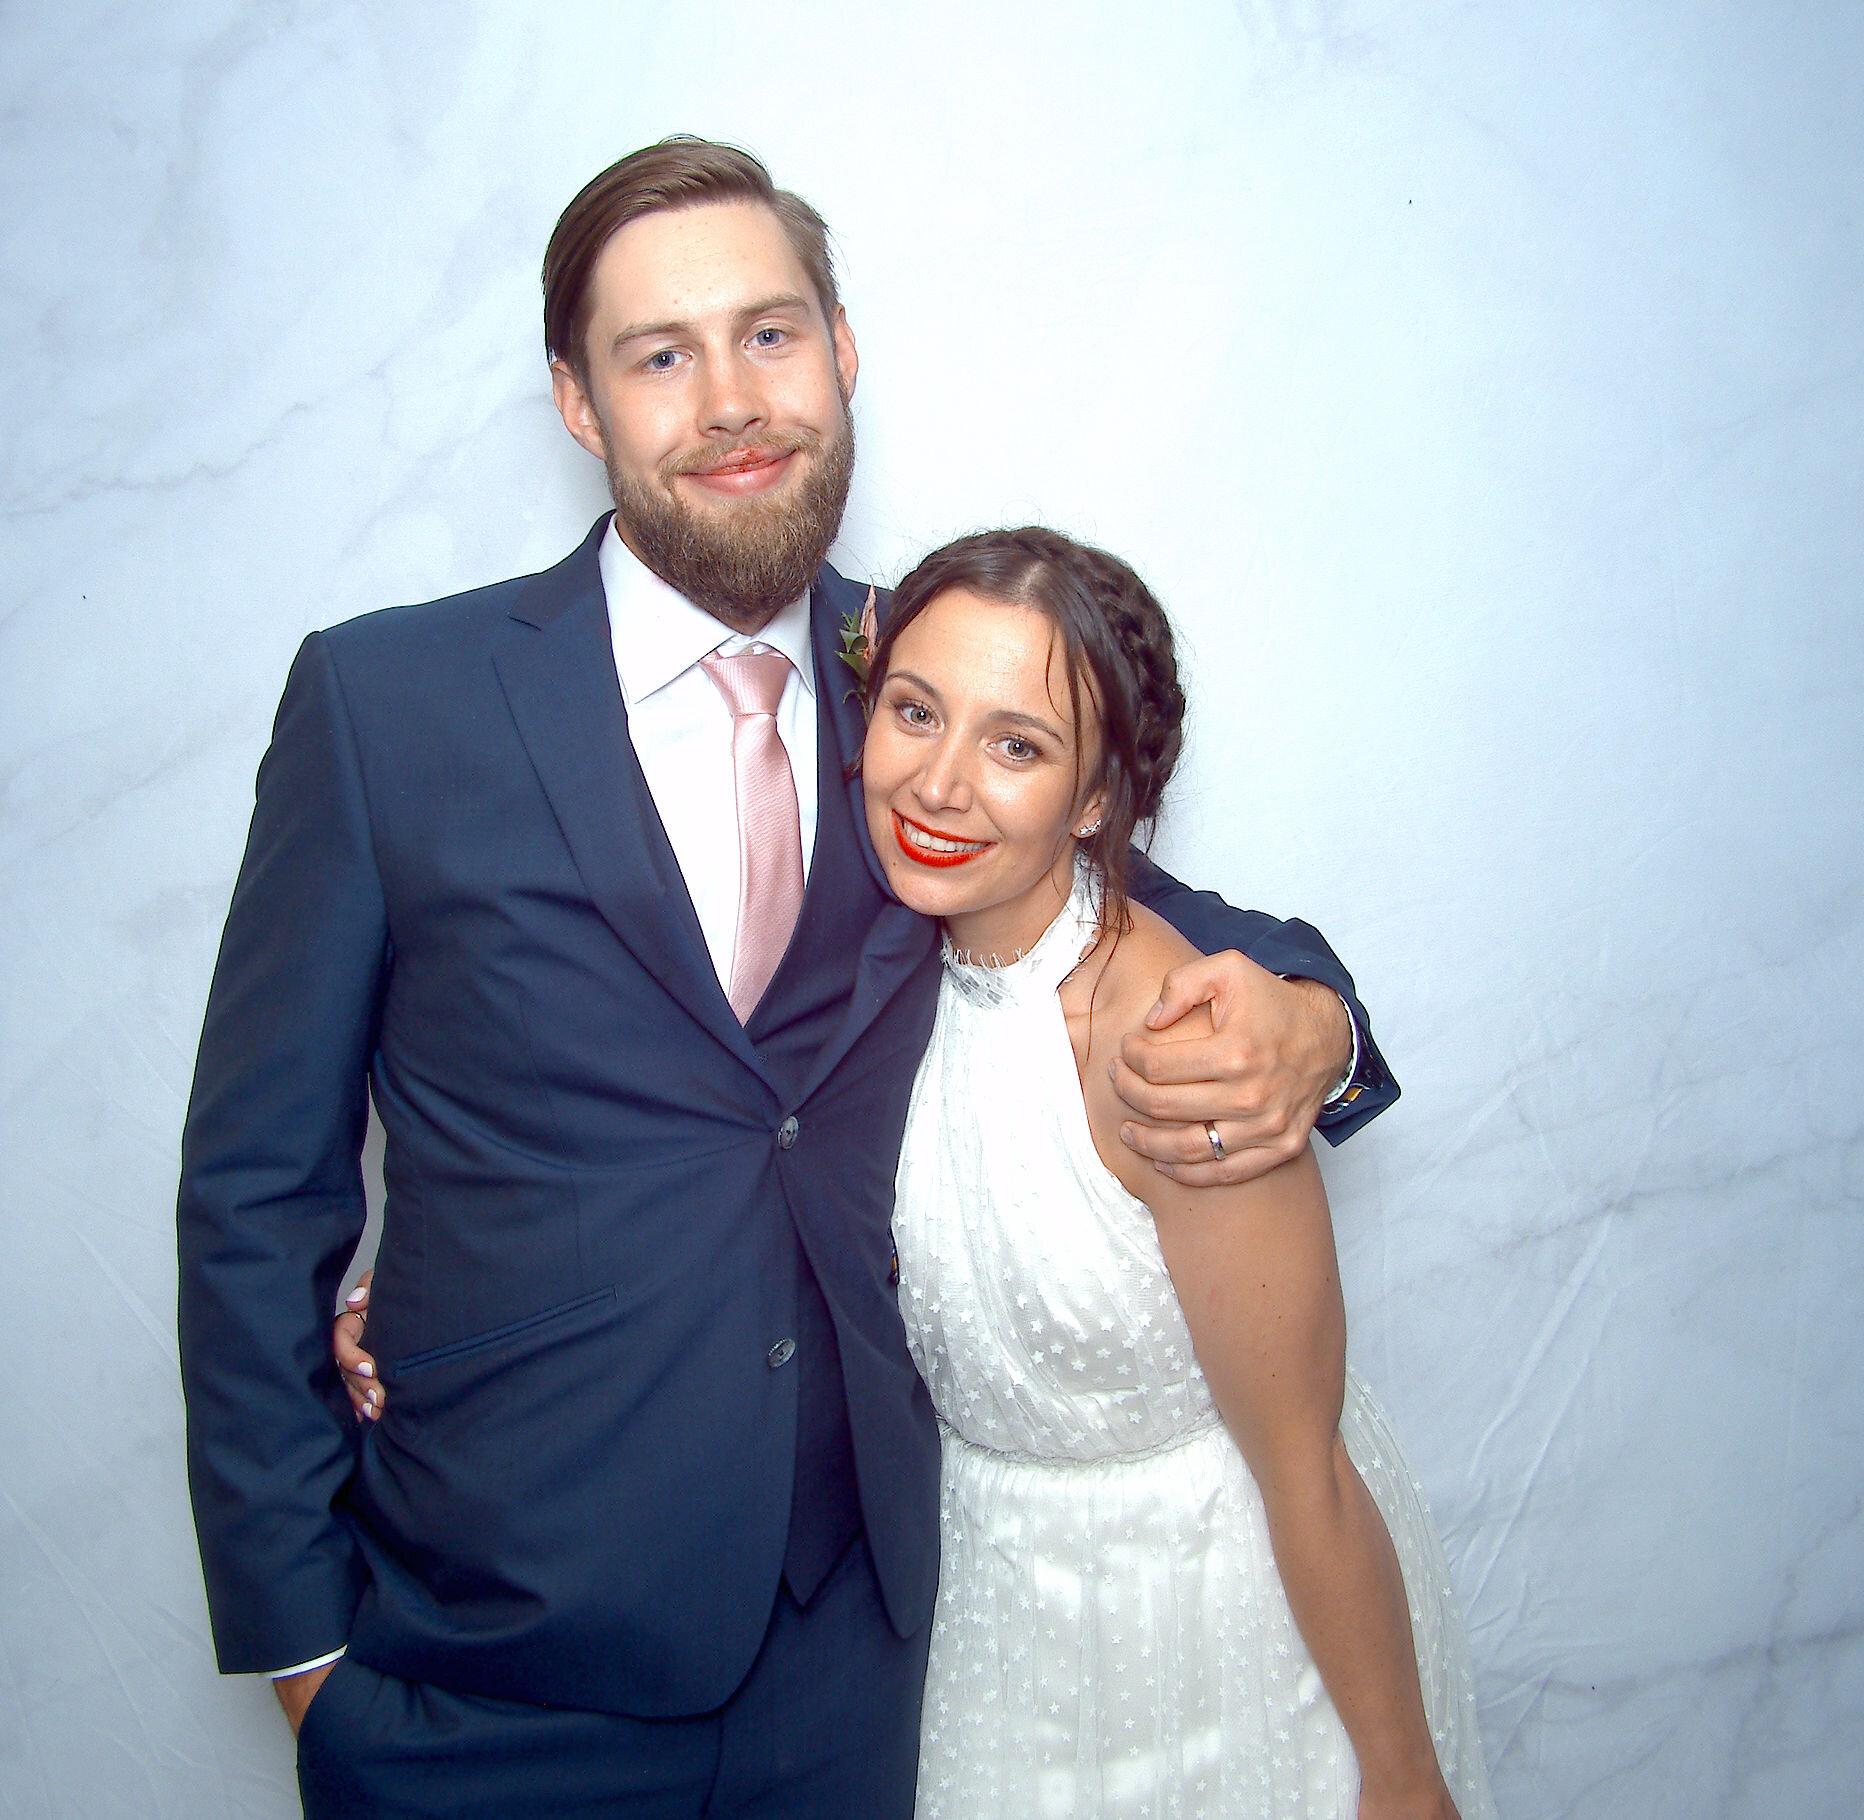 Kelly & Joe's Wedding